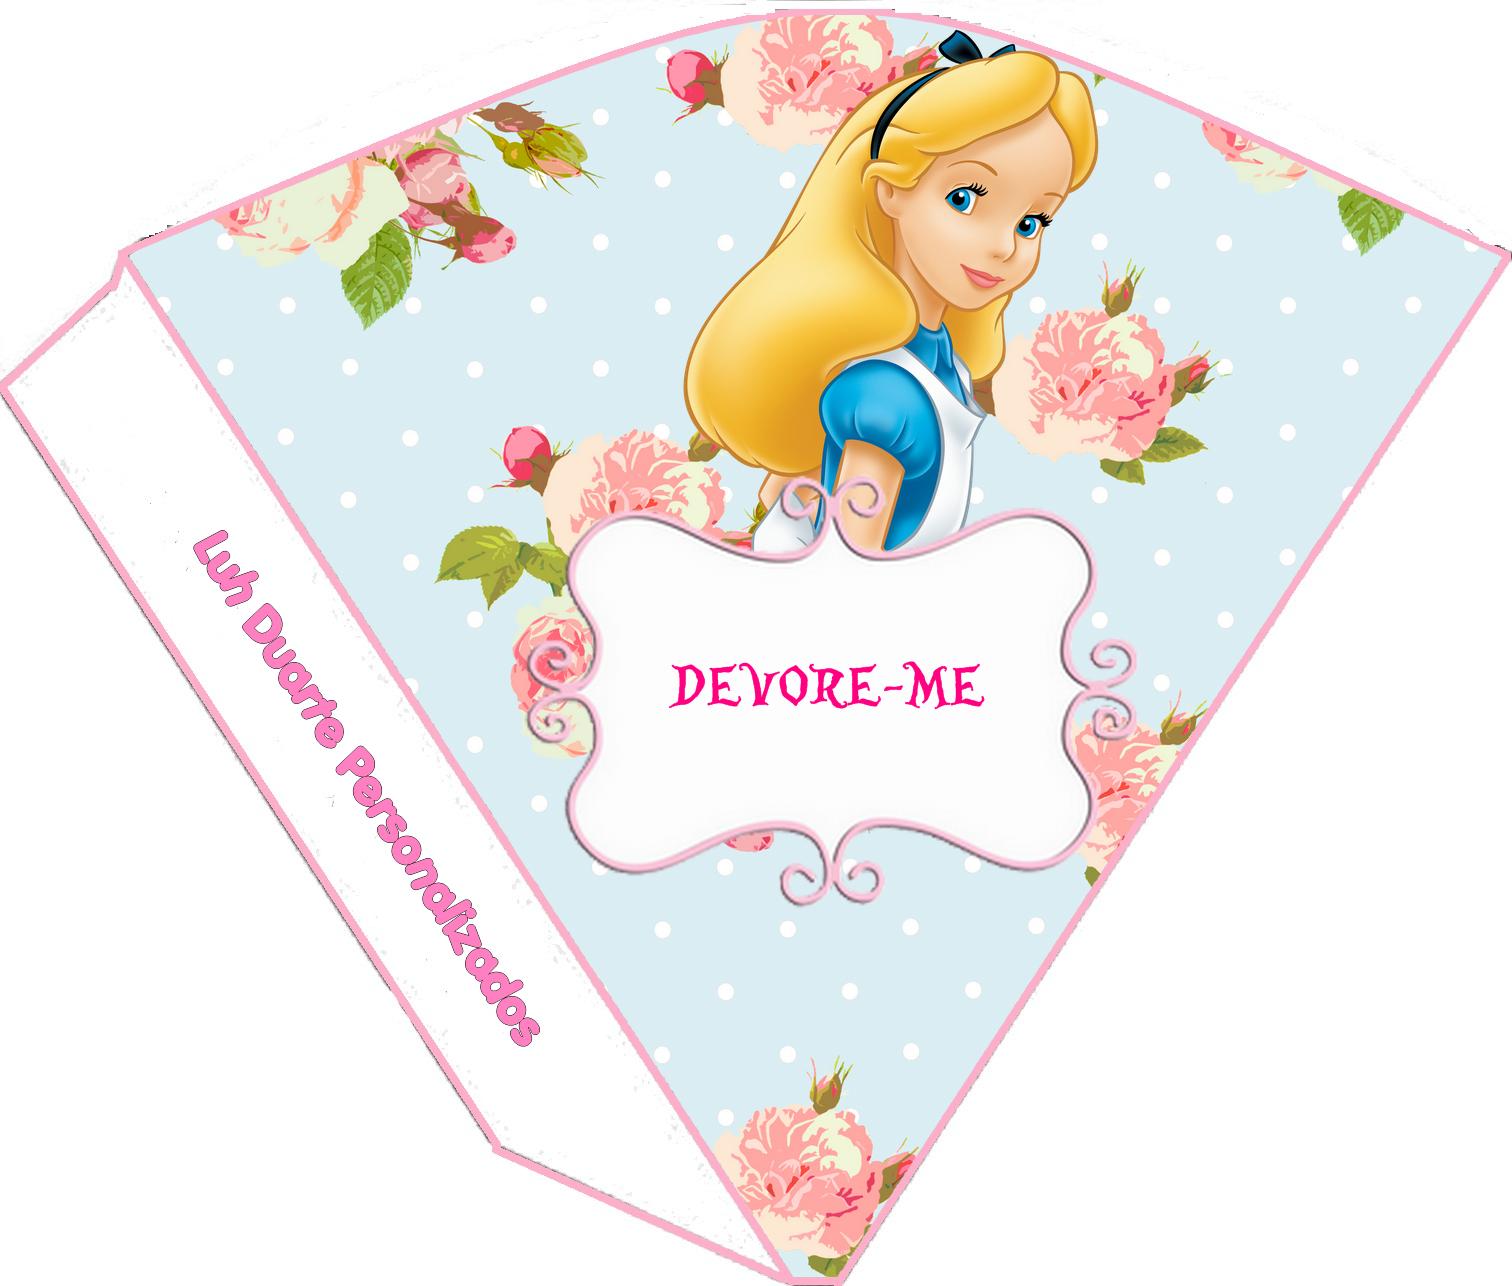 Free Printable Kit Of Alice In Wonderland Oh My Fiesta In English